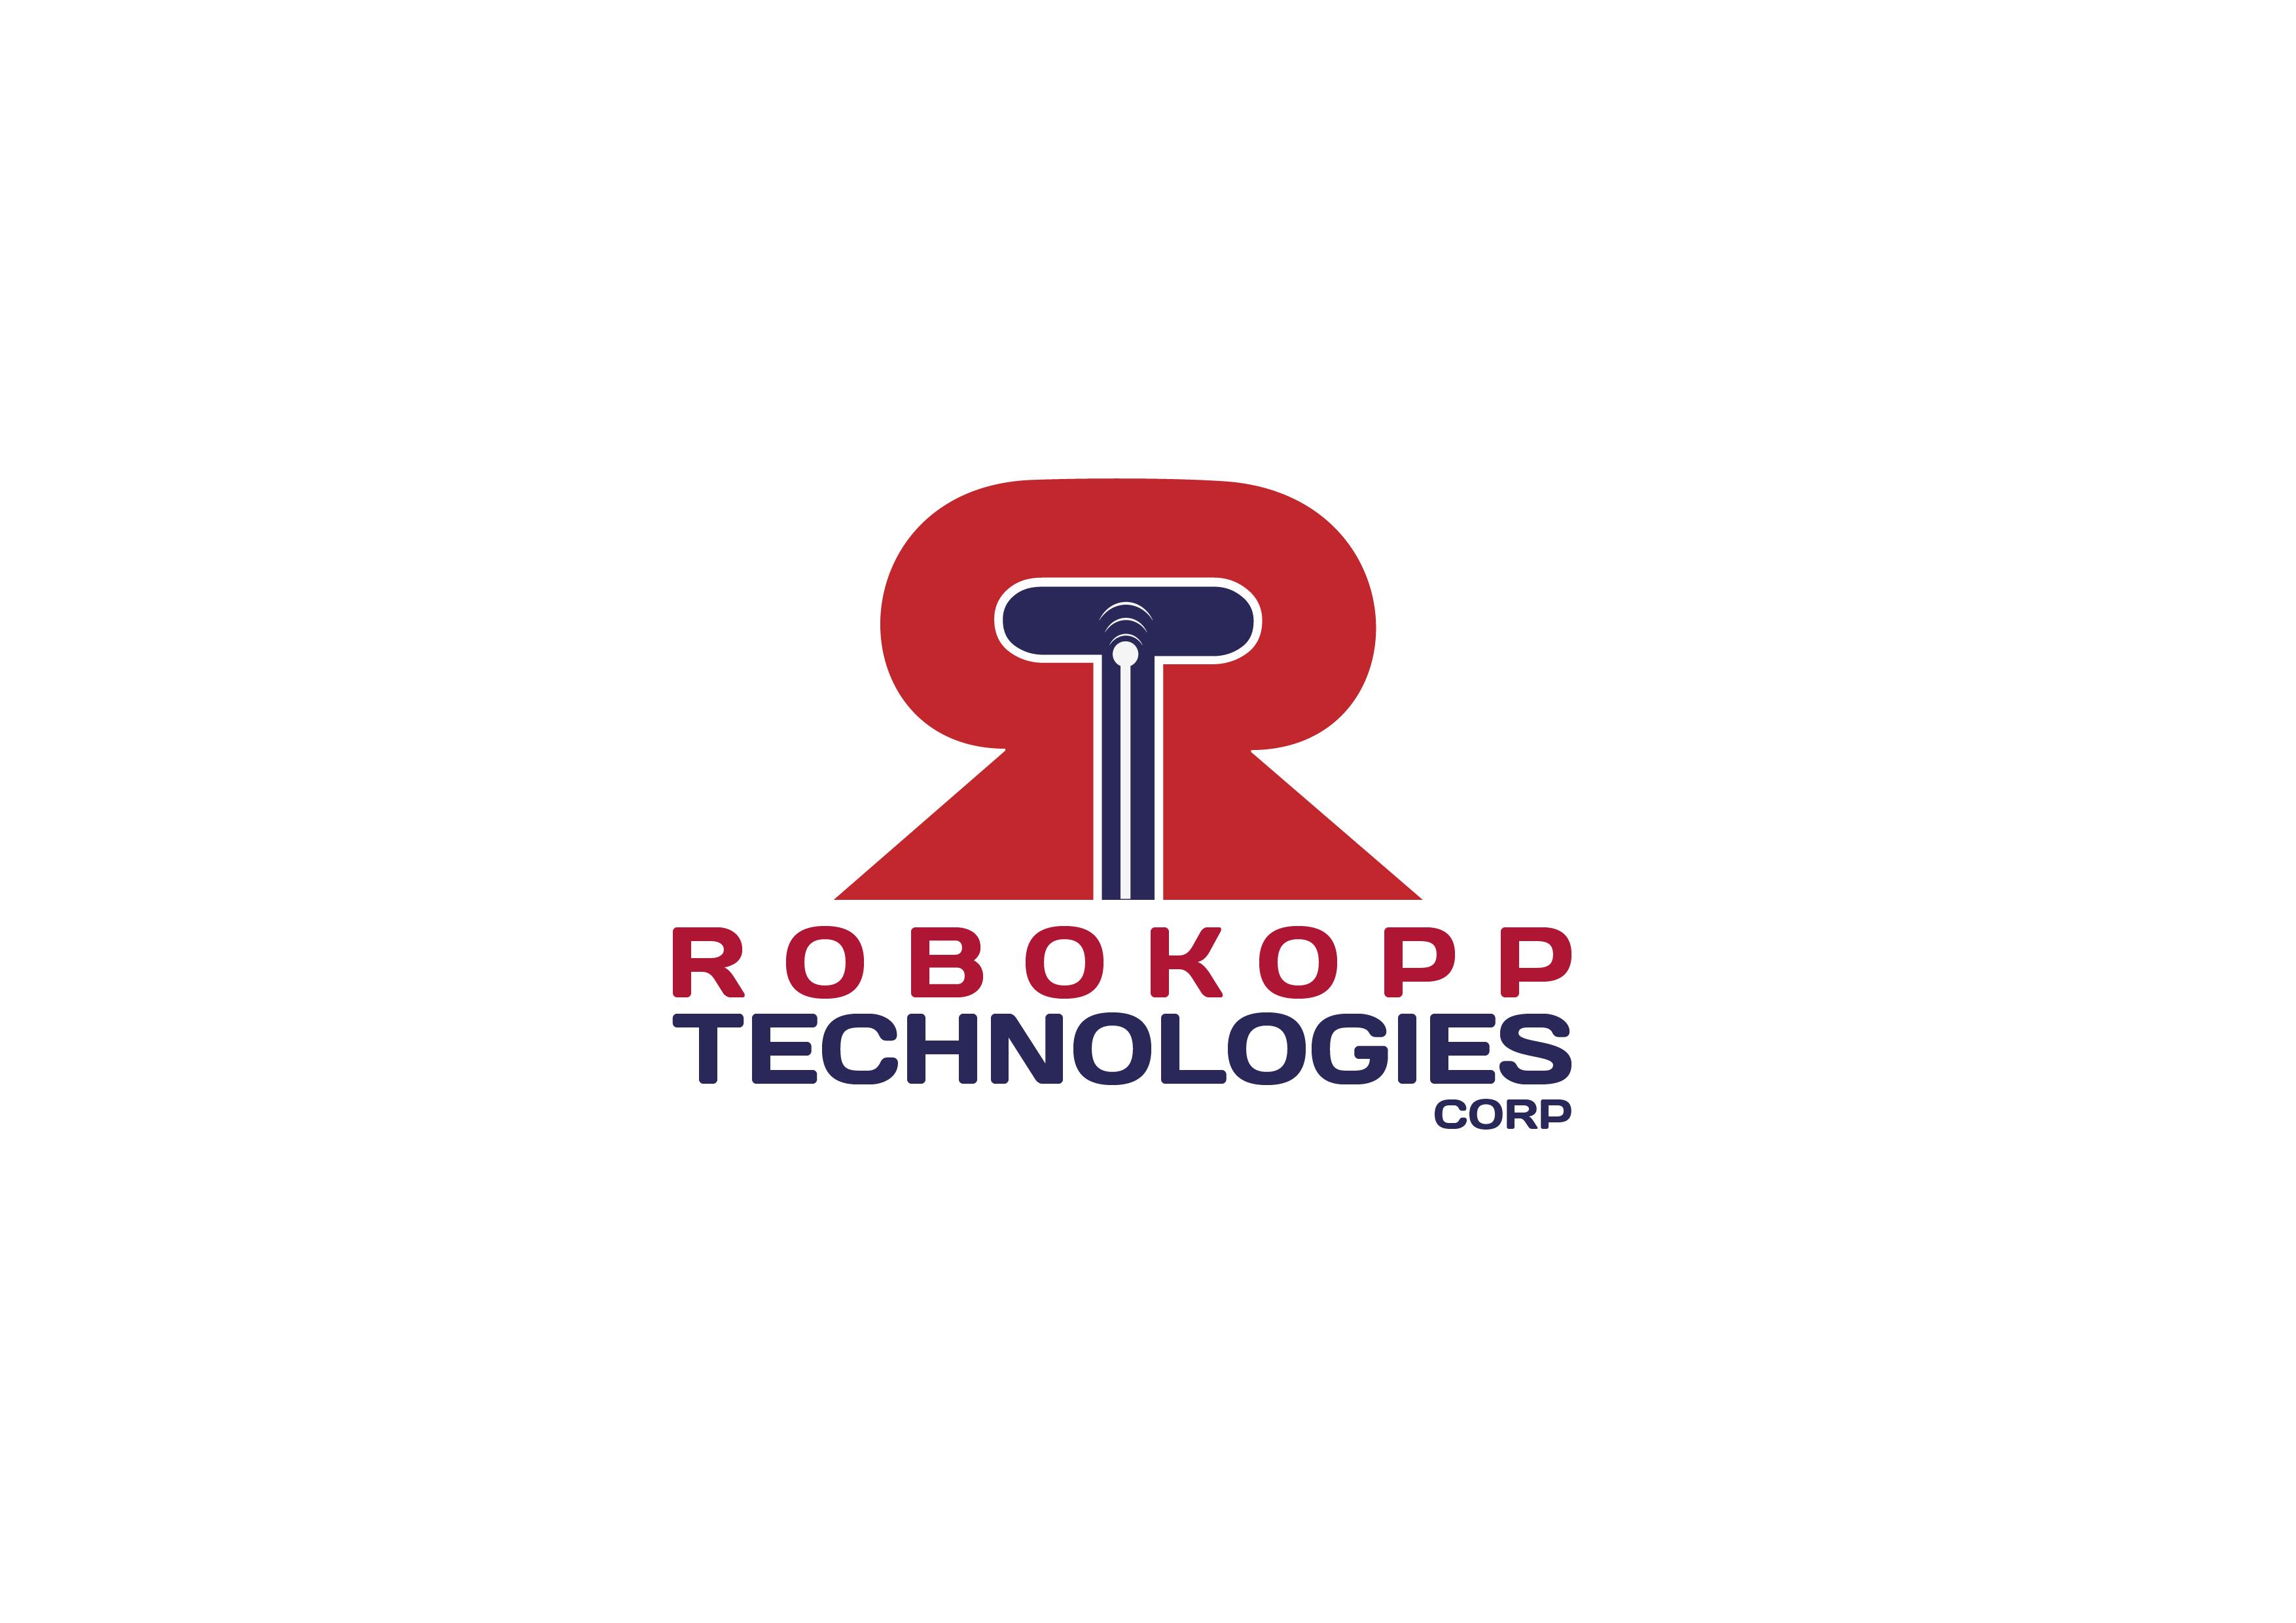 Logo Design by 3draw - Entry No. 41 in the Logo Design Contest New Logo Design for Robokopp Technologies Corp..